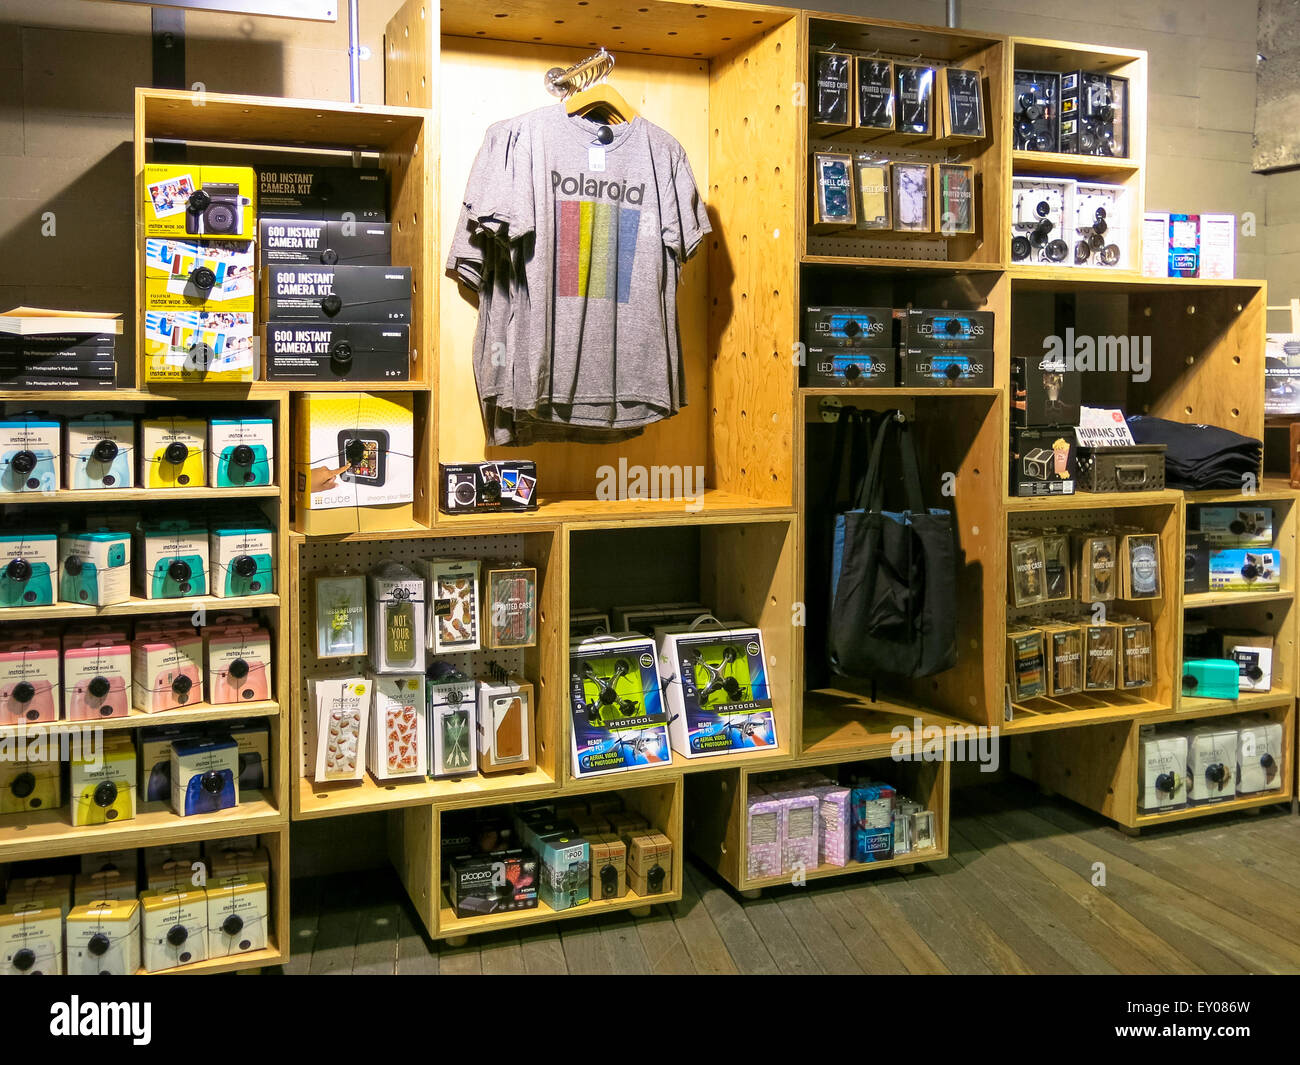 Polaroid Camera Urban Outfitters Uk : Urban outfitters inside stock photos urban outfitters inside